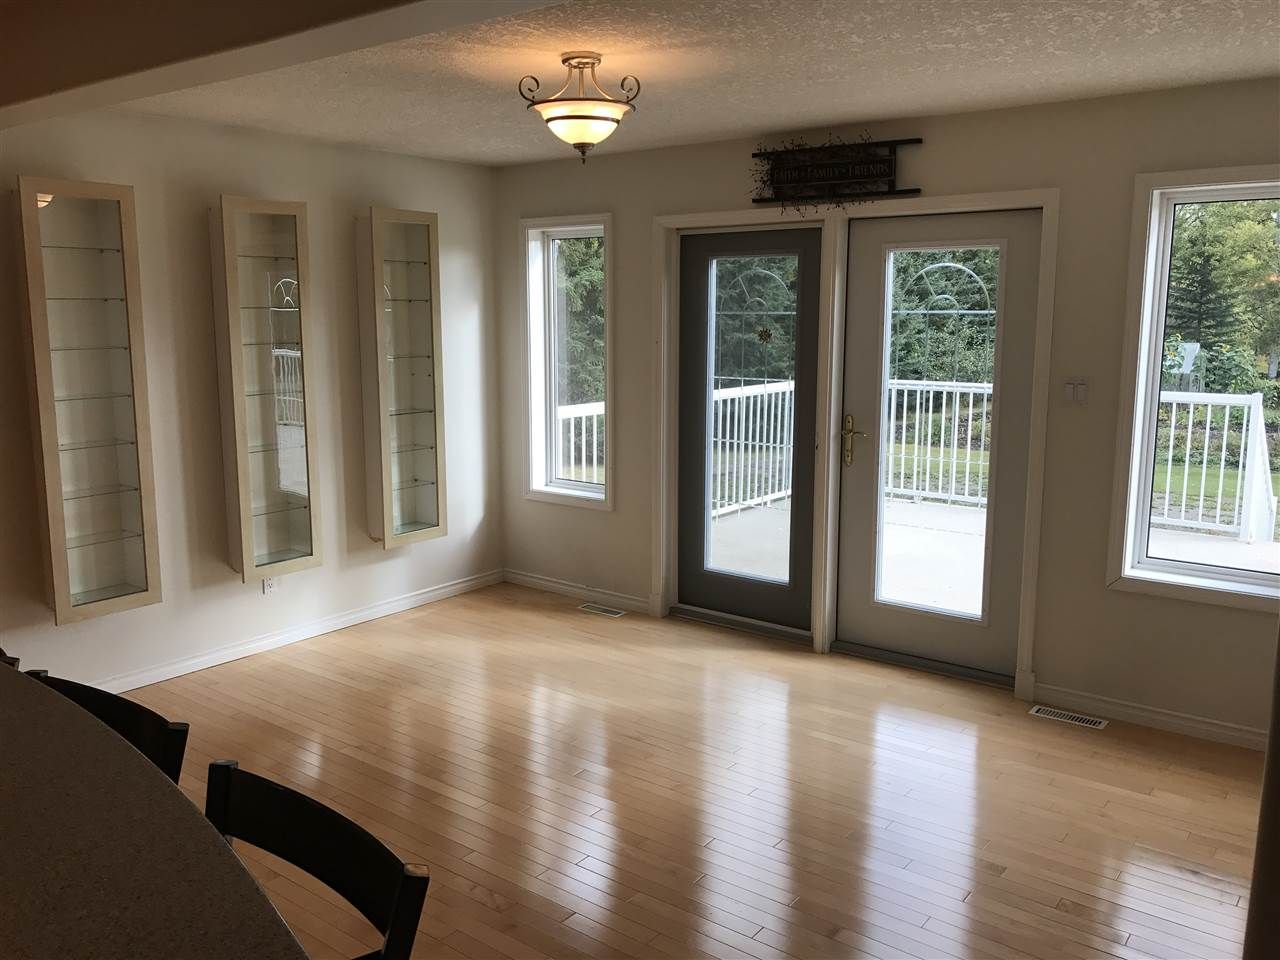 Photo 9: Photos: 9813 269 Road in Fort St. John: Fort St. John - Rural W 100th House for sale (Fort St. John (Zone 60))  : MLS®# R2208403